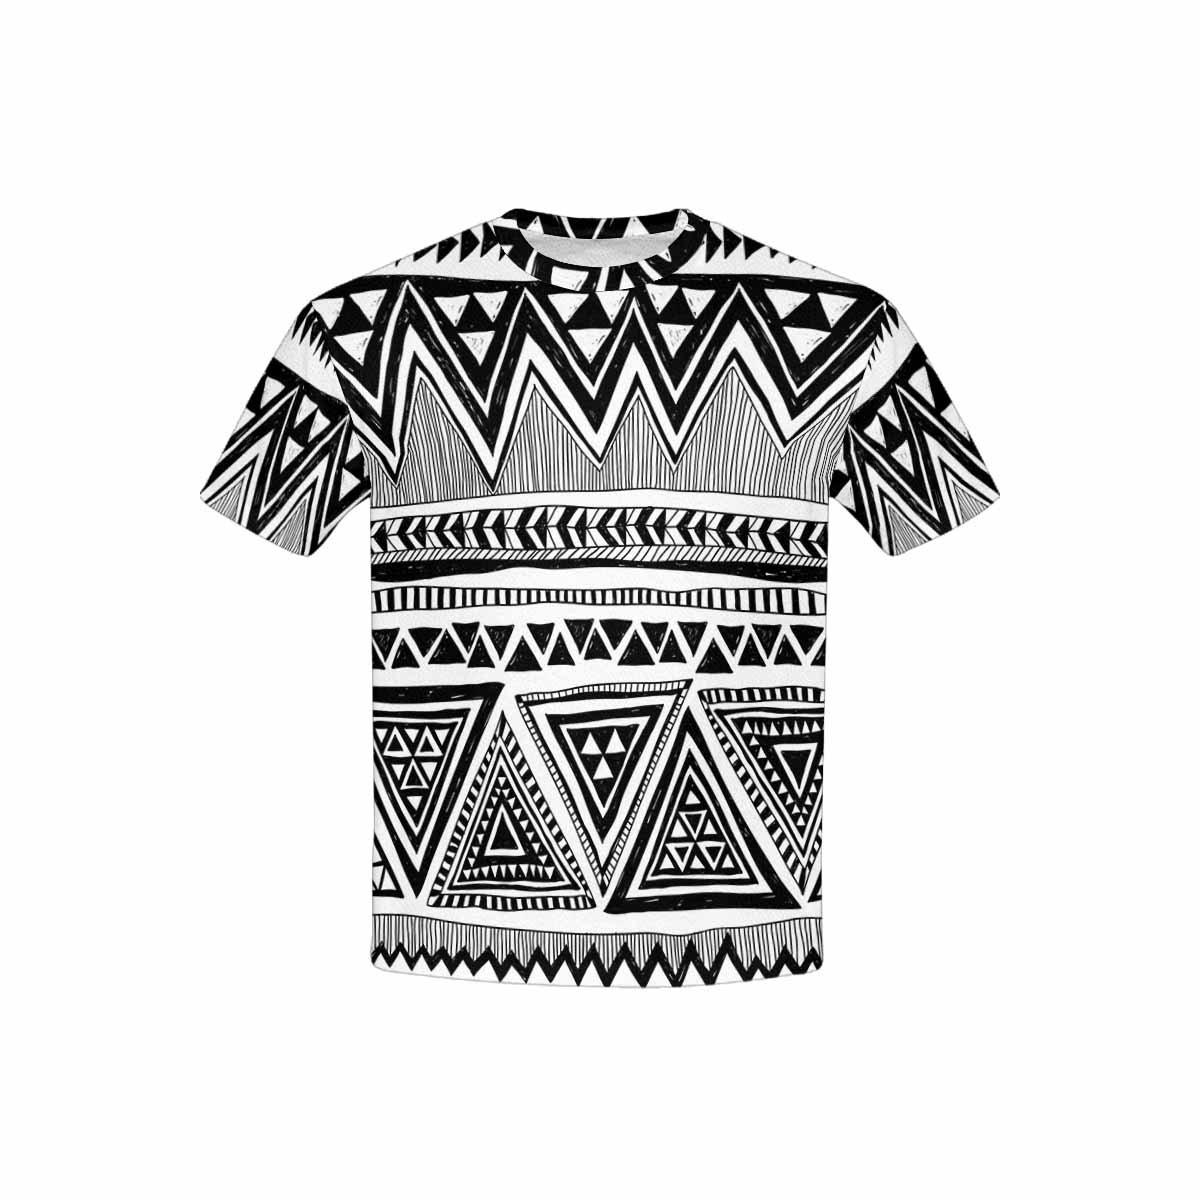 INTERESTPRINT Kids T-Shirts Ethnic Vintage Print XS-XL